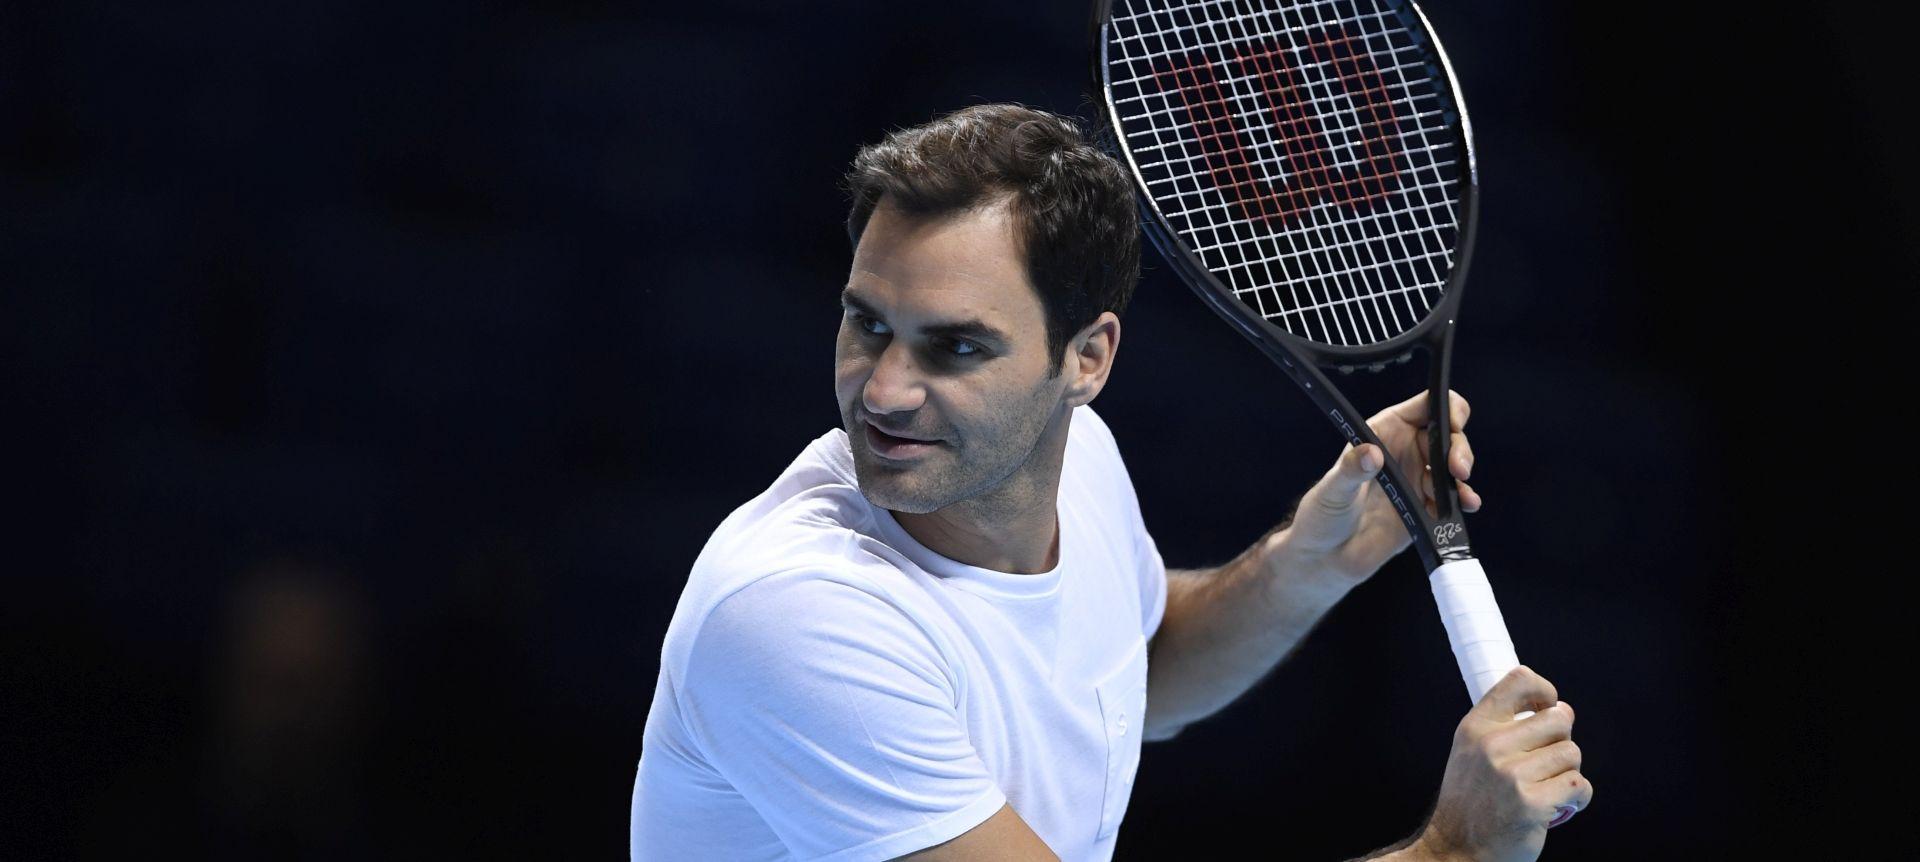 ATP HALLE  Federer u finalu čeka Ćorića ili Bautistu Aguta